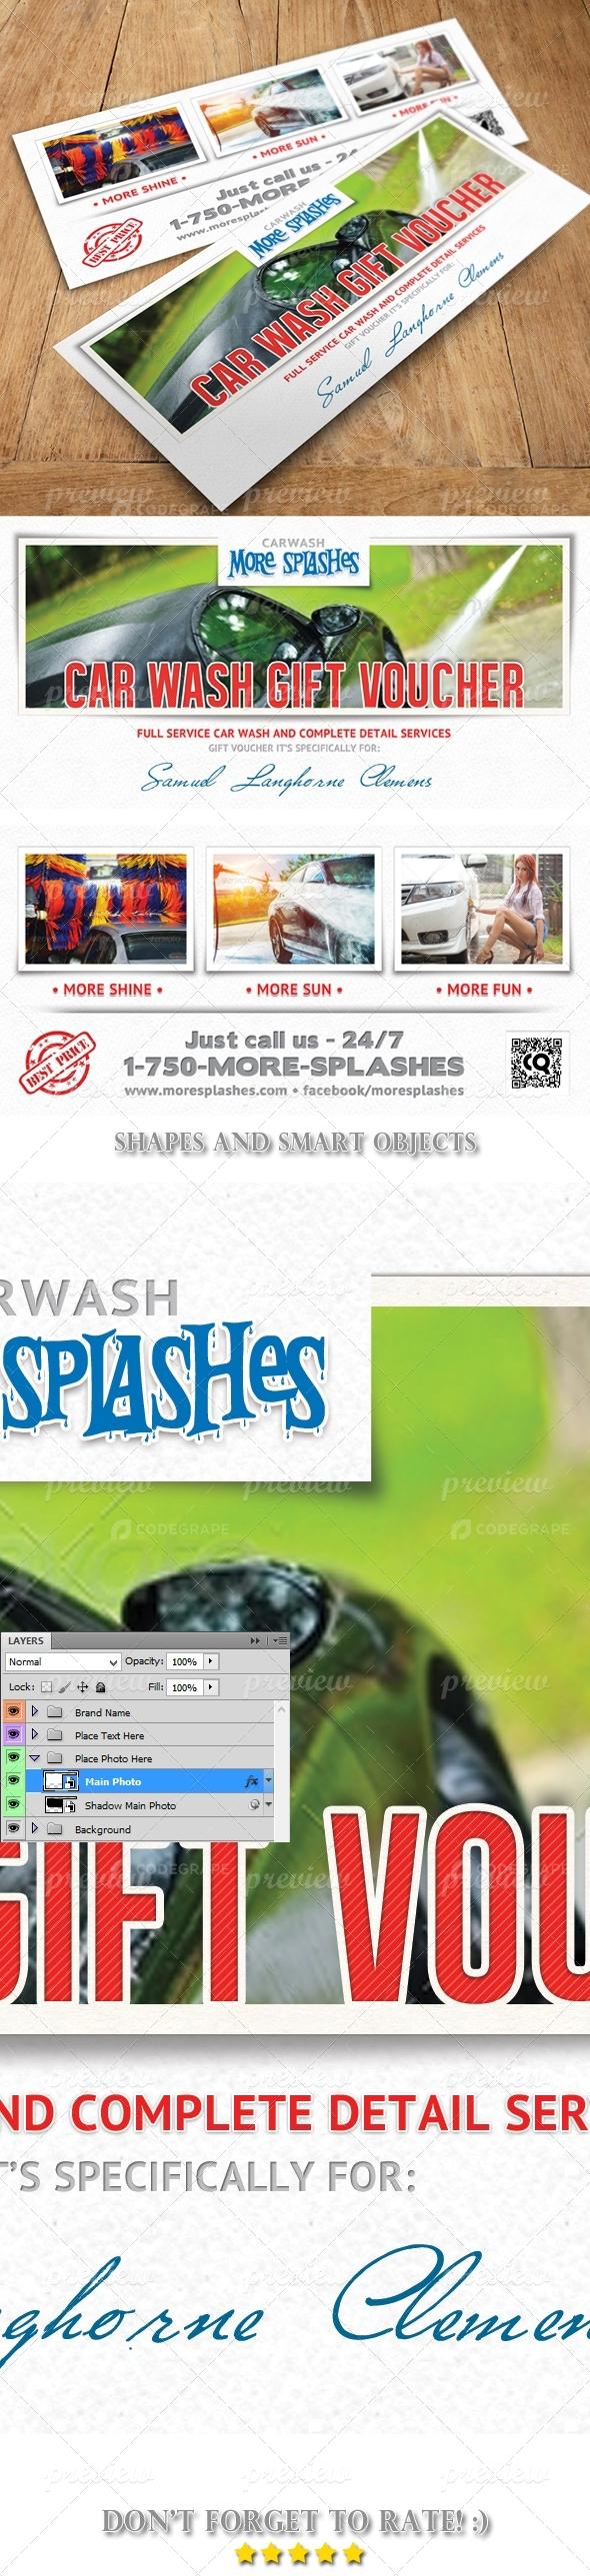 Car Wash Voucher Template